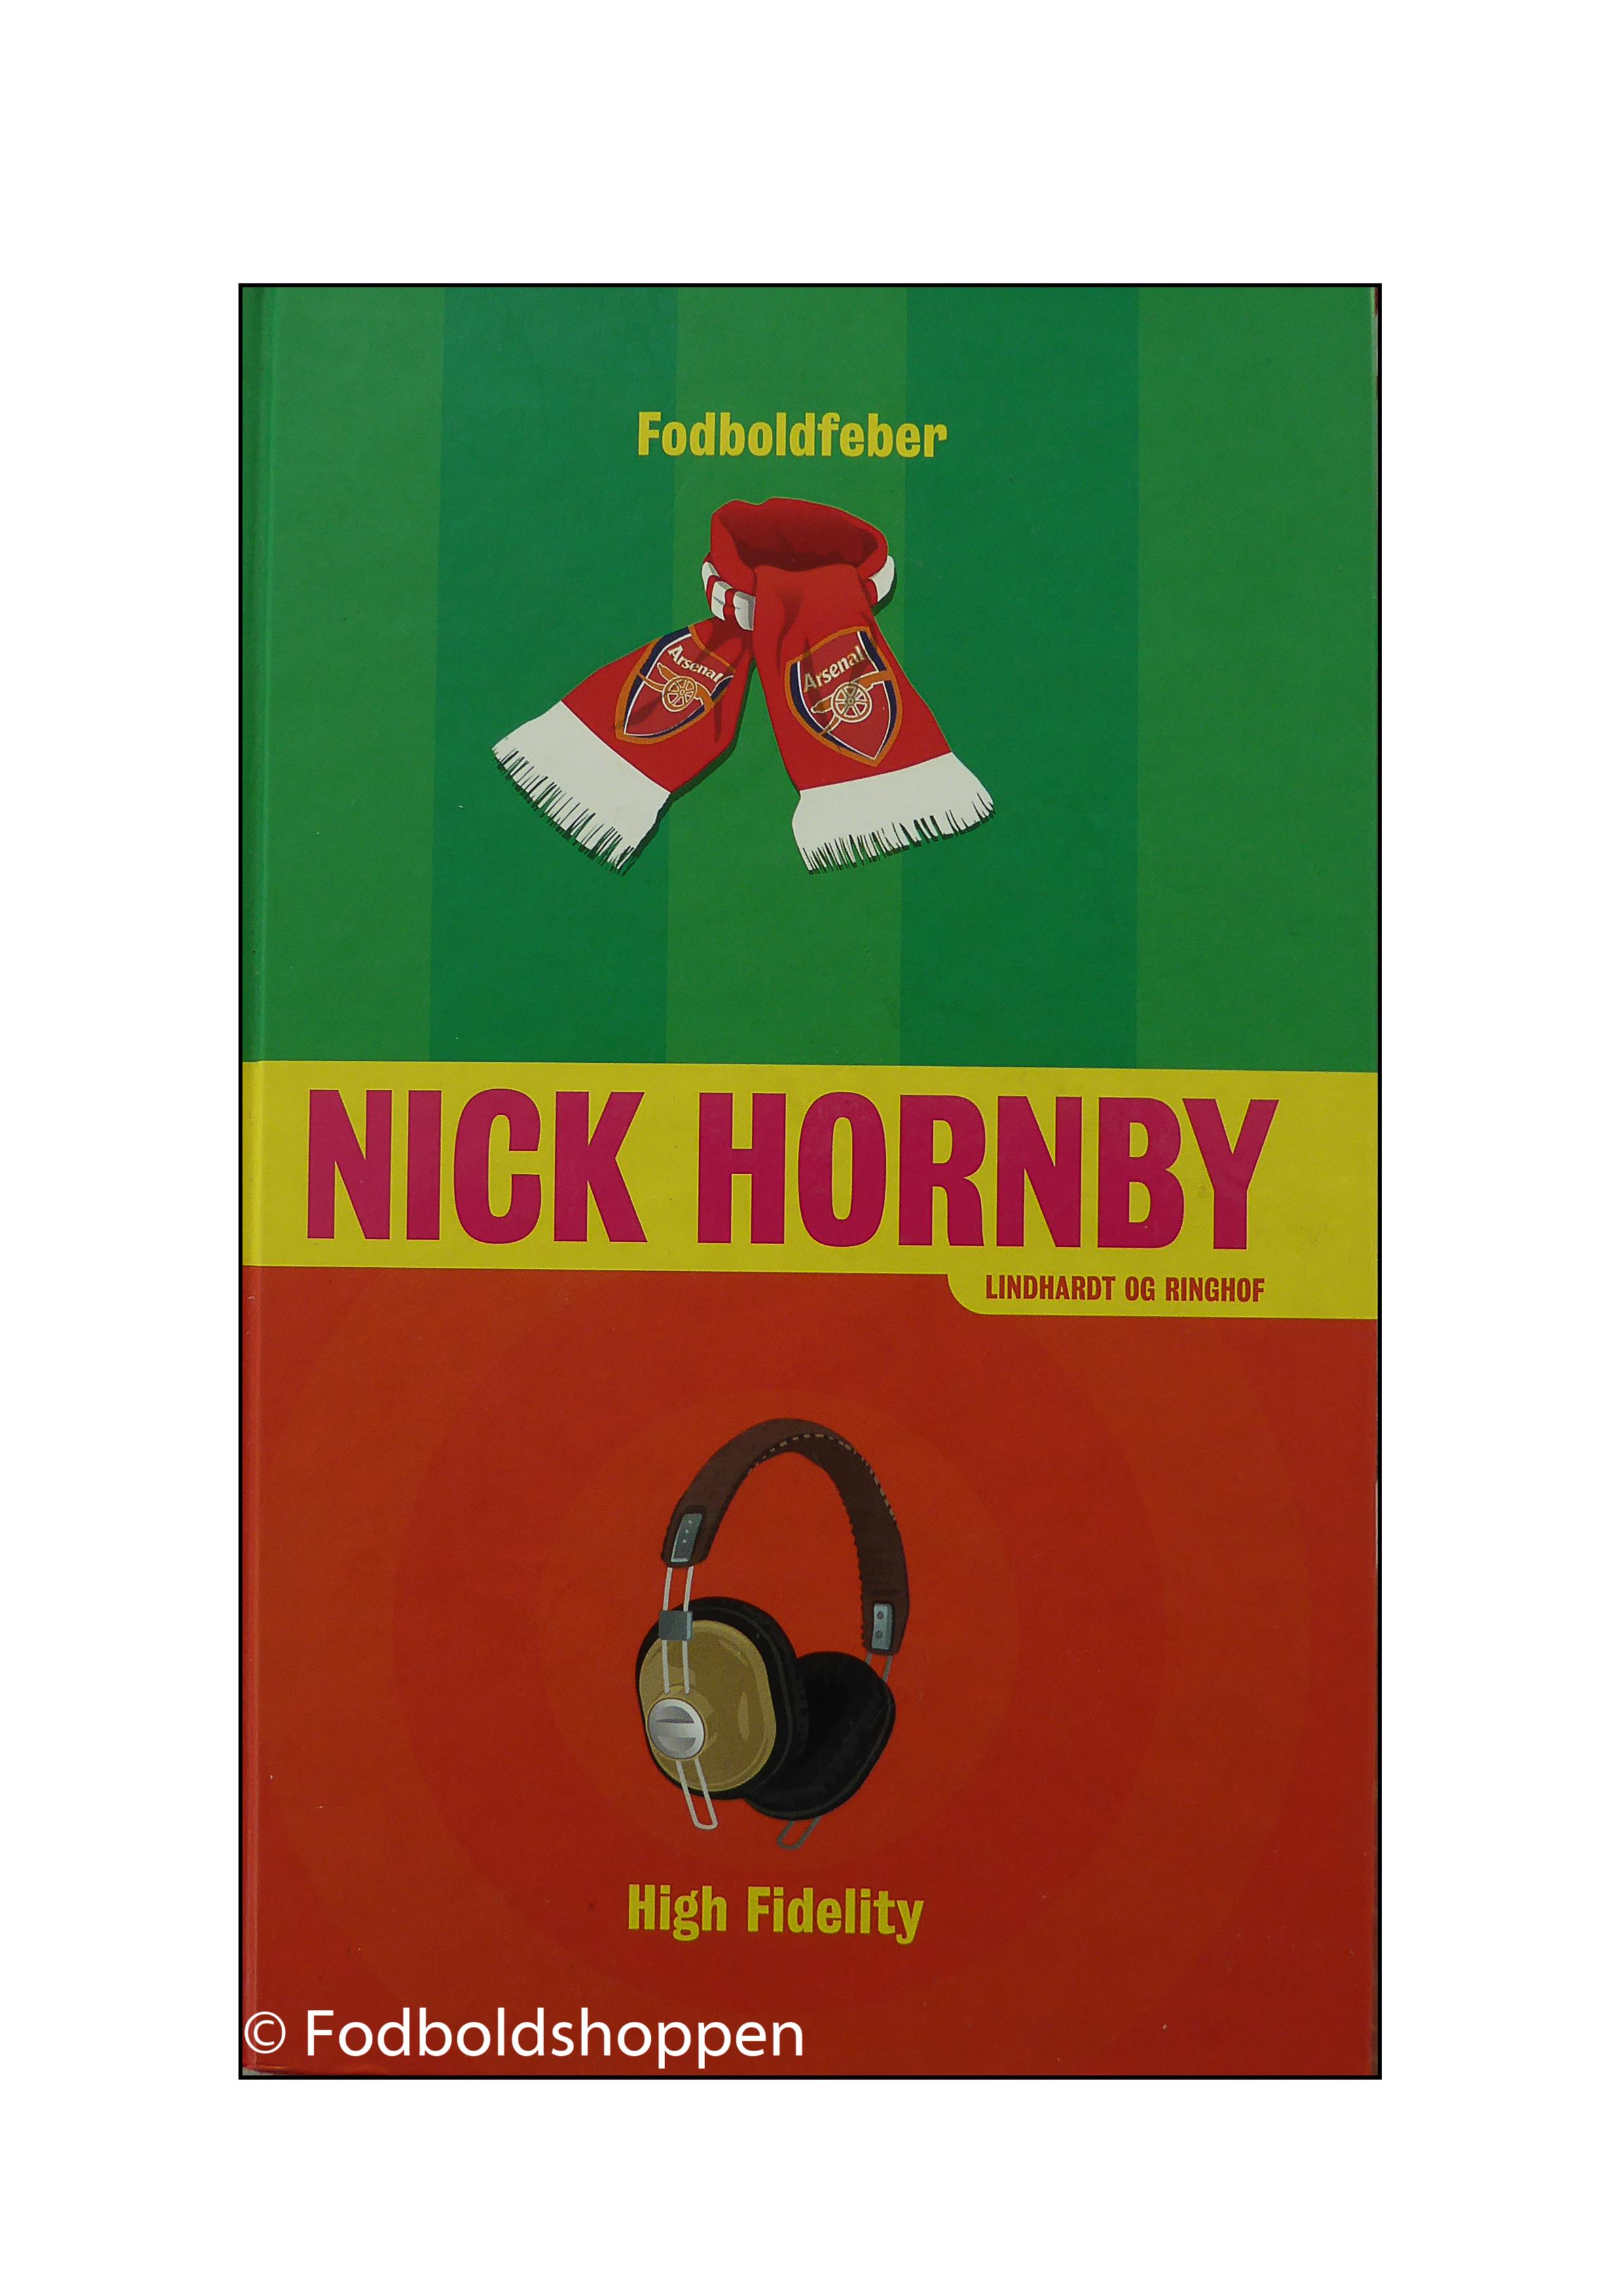 Roman : Nick Hornby - Fodboldfeber / High Fidelity